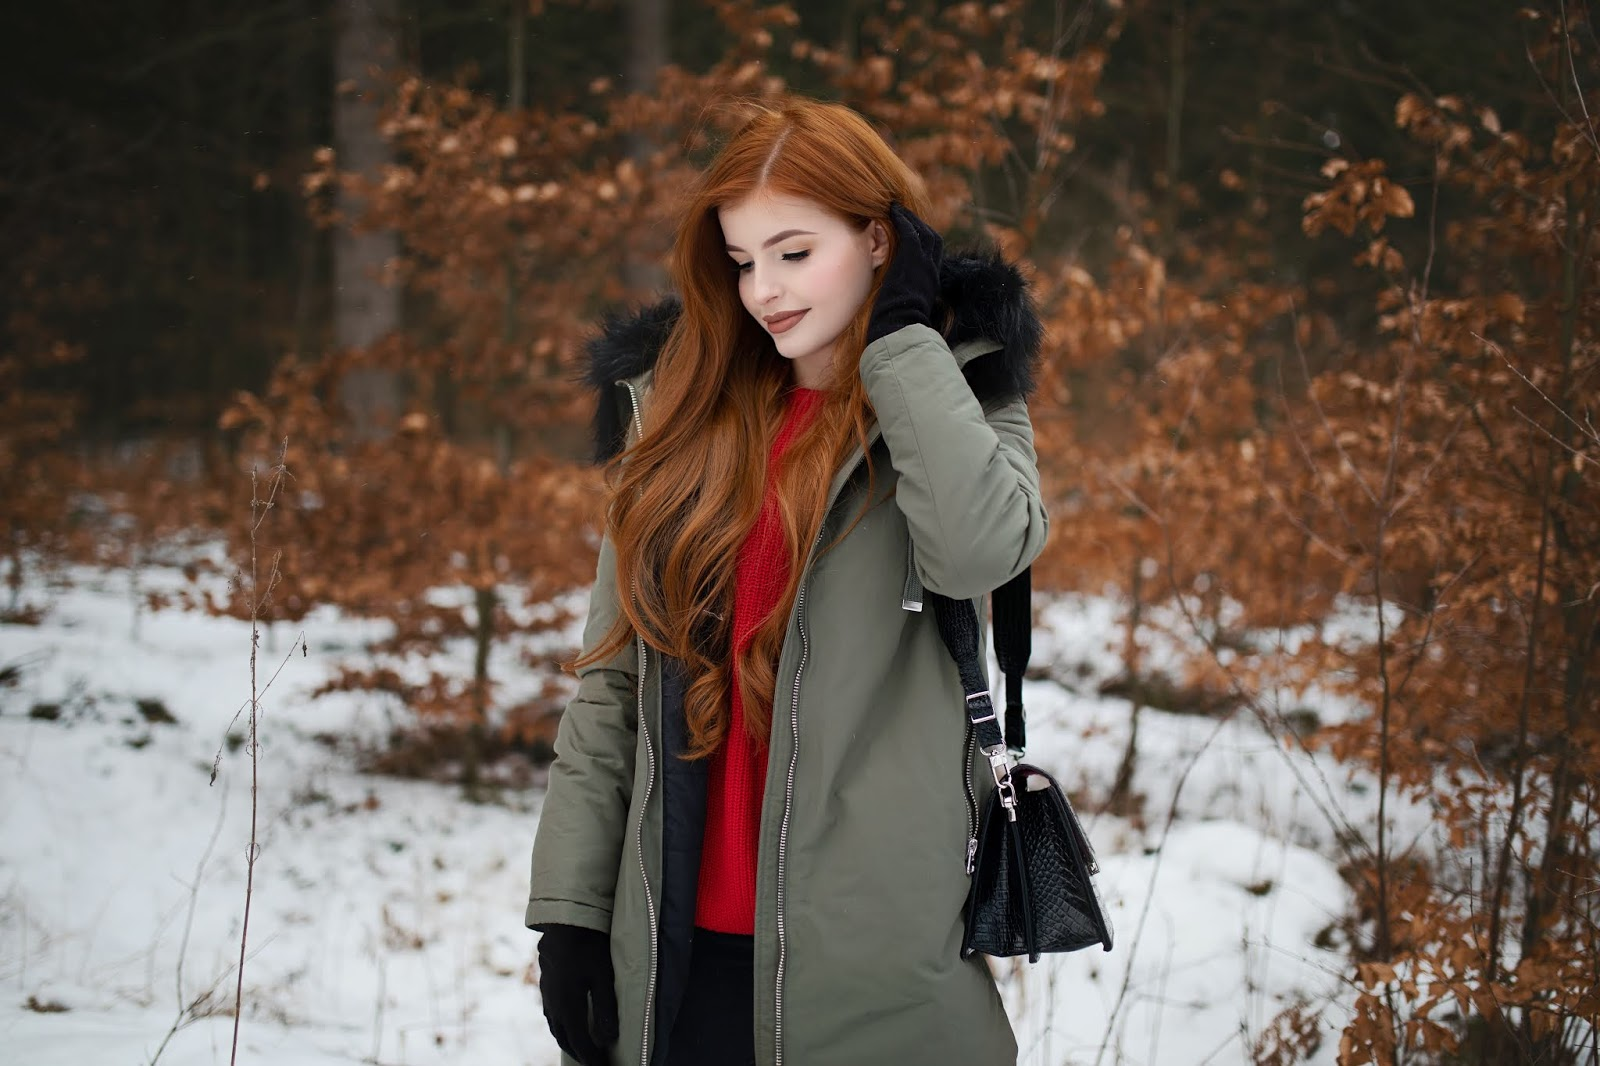 henna-sattva-ruda-cassia-blog-efekty.JPG